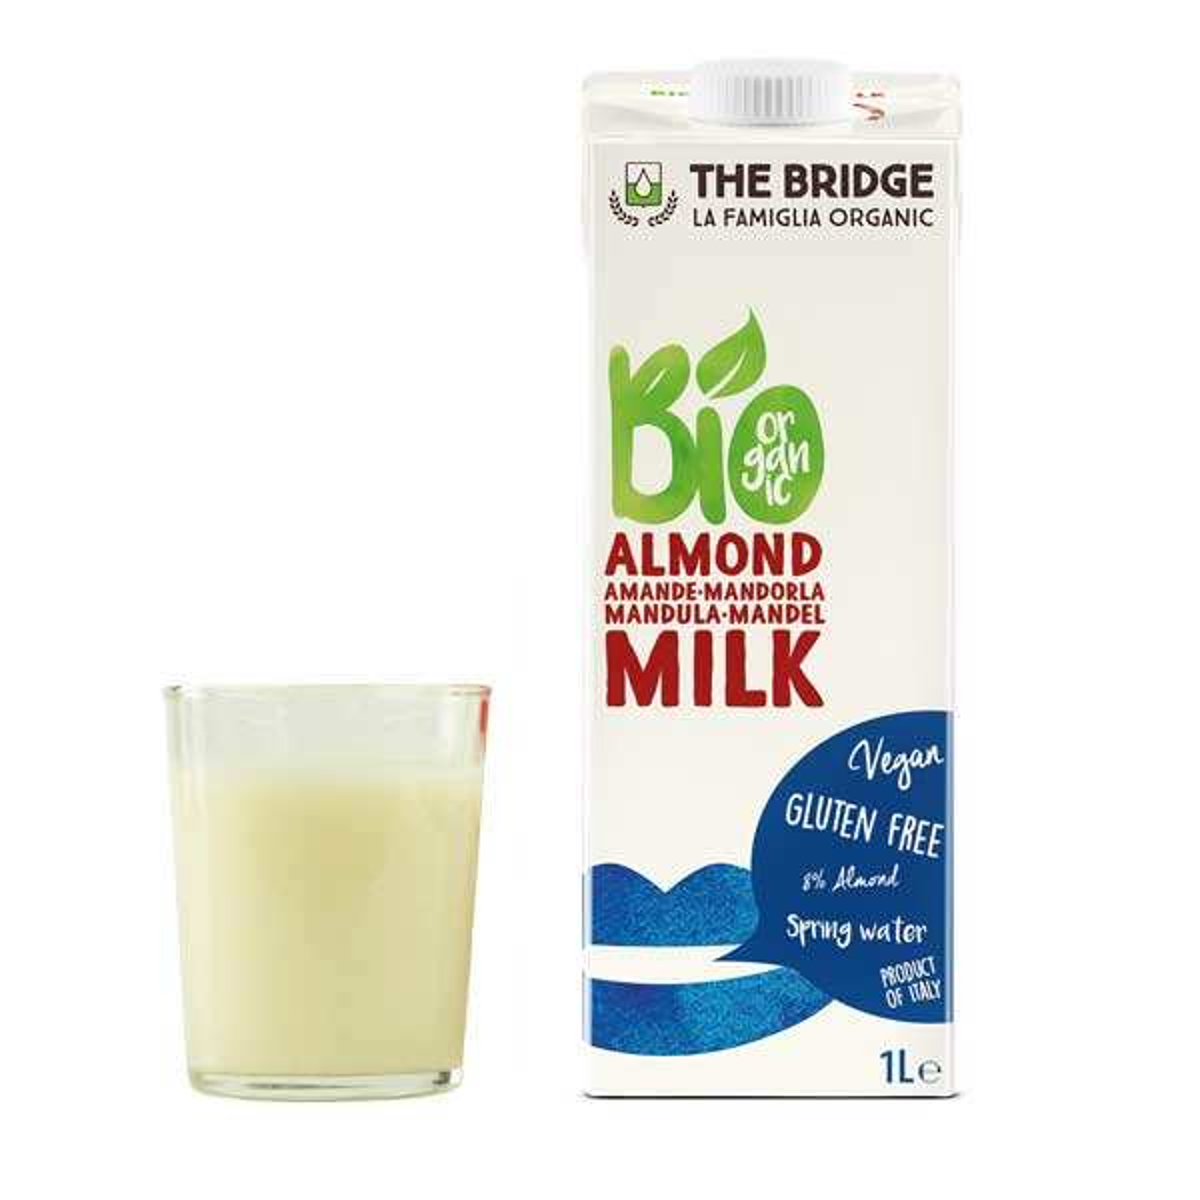 Organic and Gluten-Freee Almond Beverage